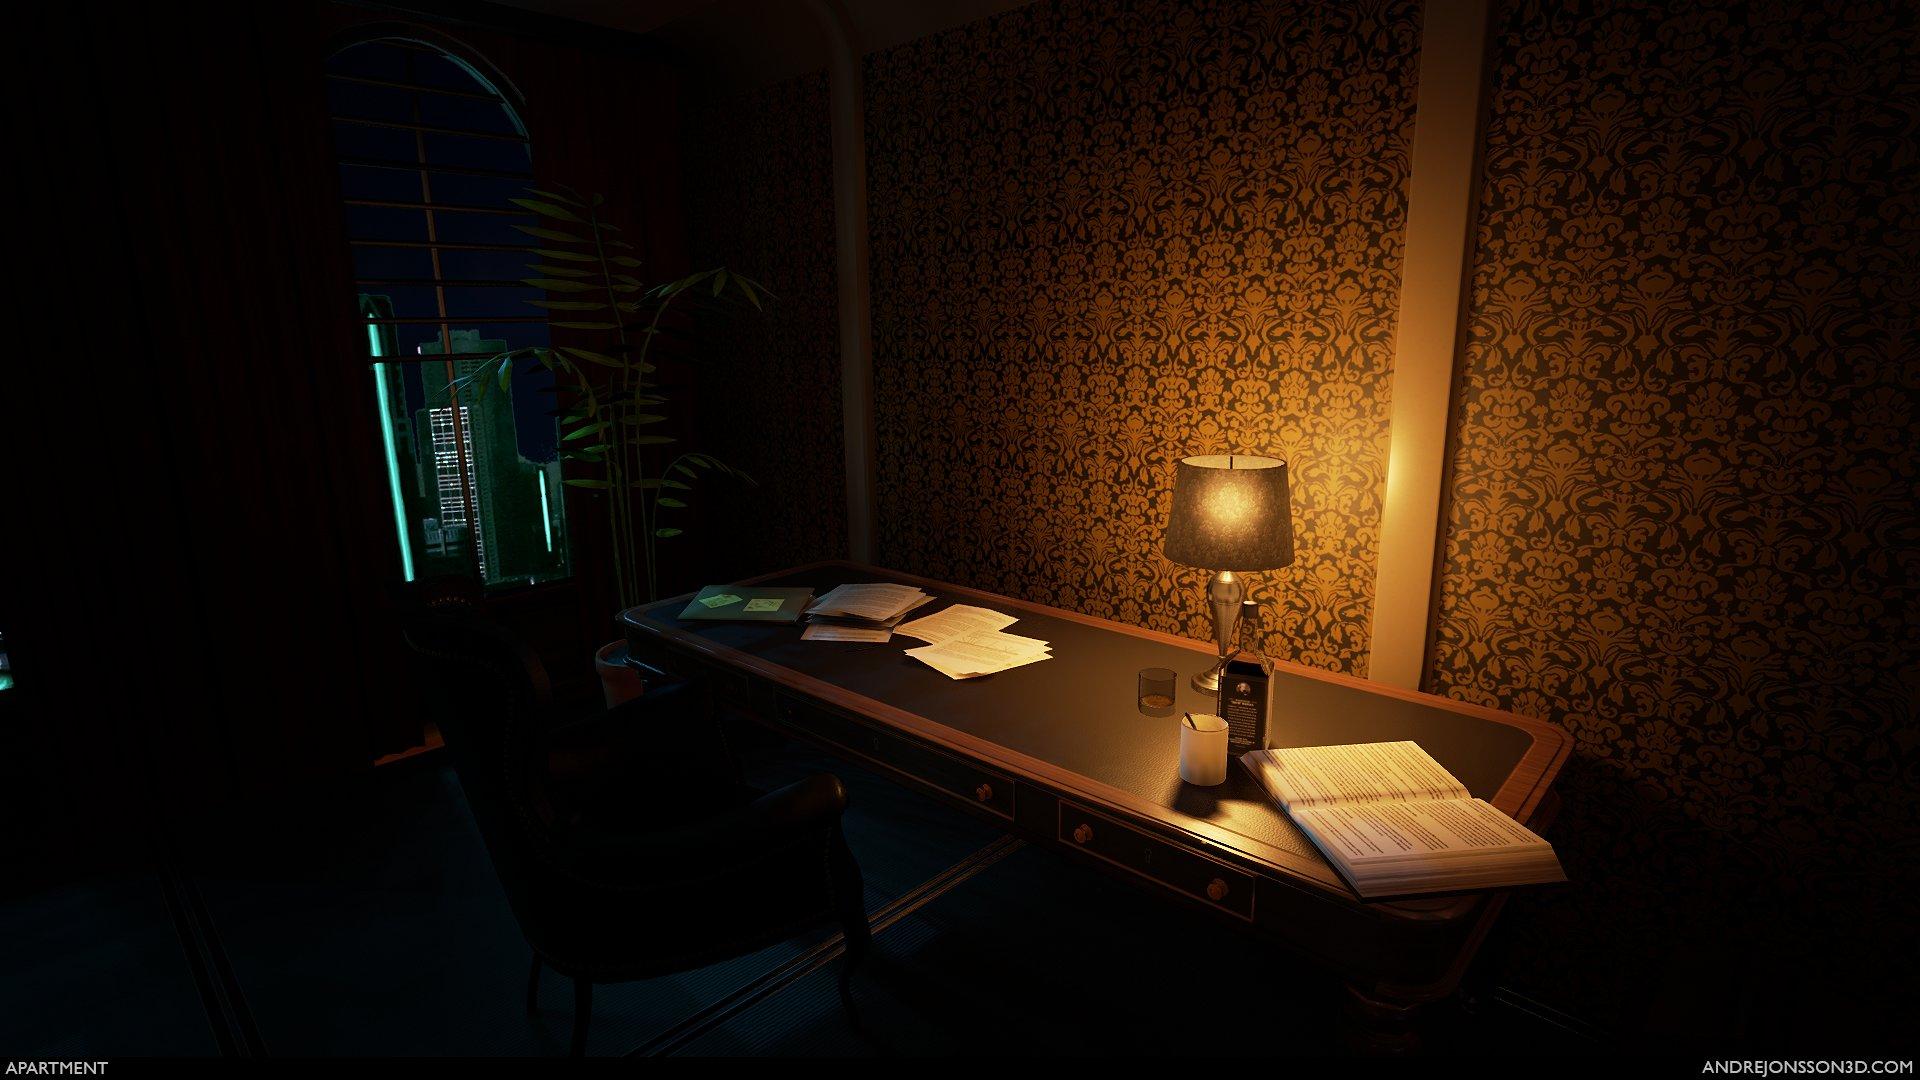 Andre jonsson apartment 08